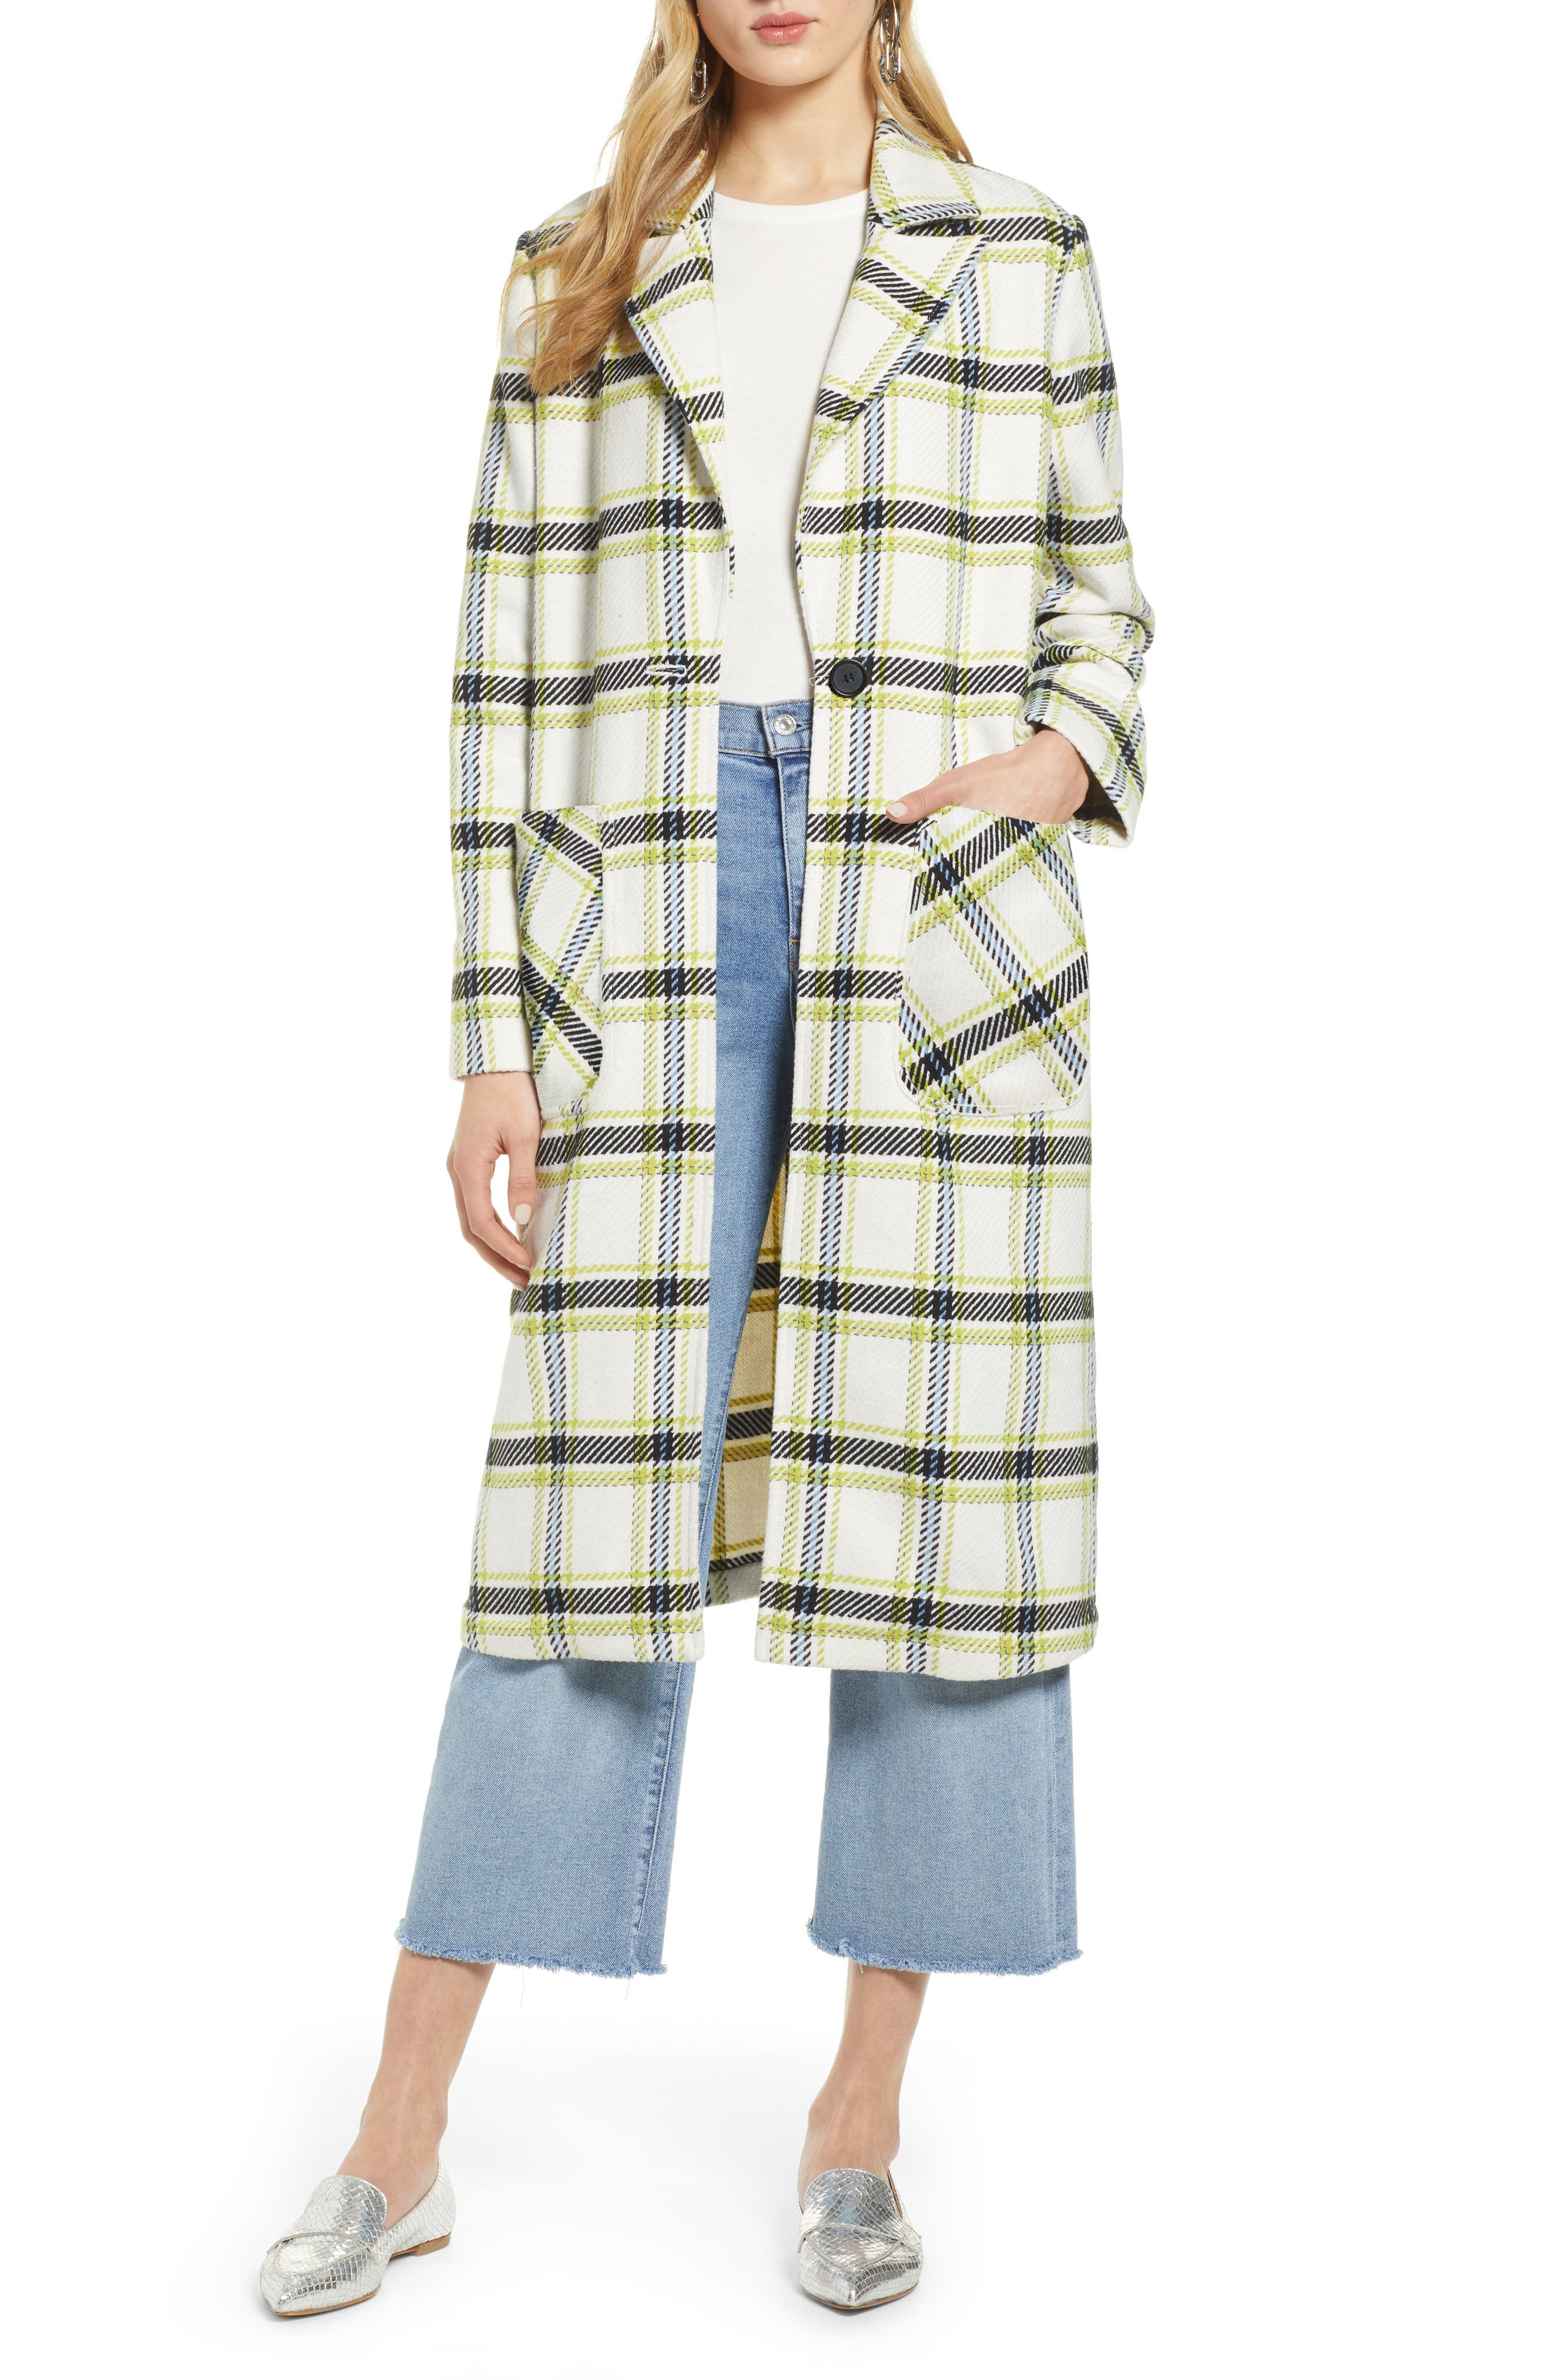 stylish petite clothes